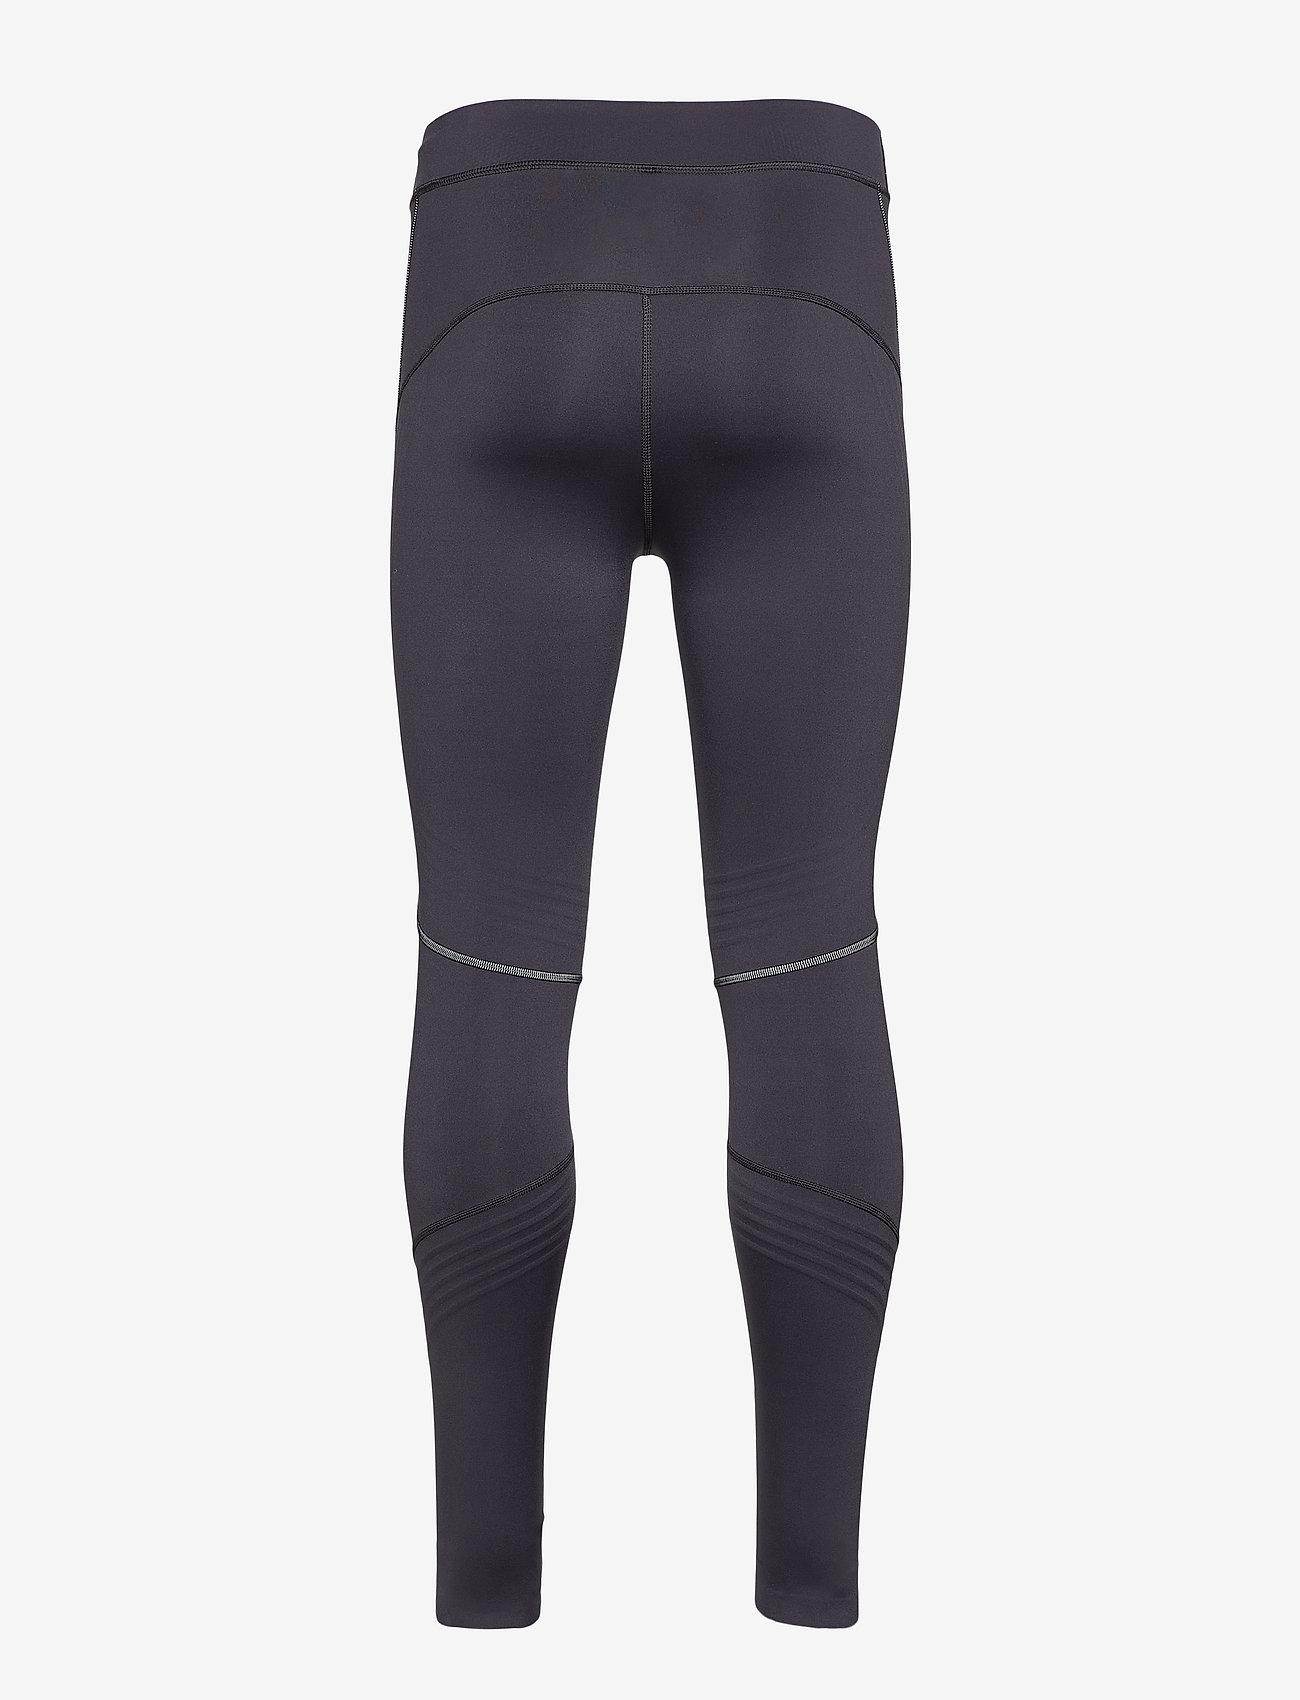 Superdry - PERFORMANCE FLOCK COMPRESSION LEGGING - spodnie treningowe - black - 1